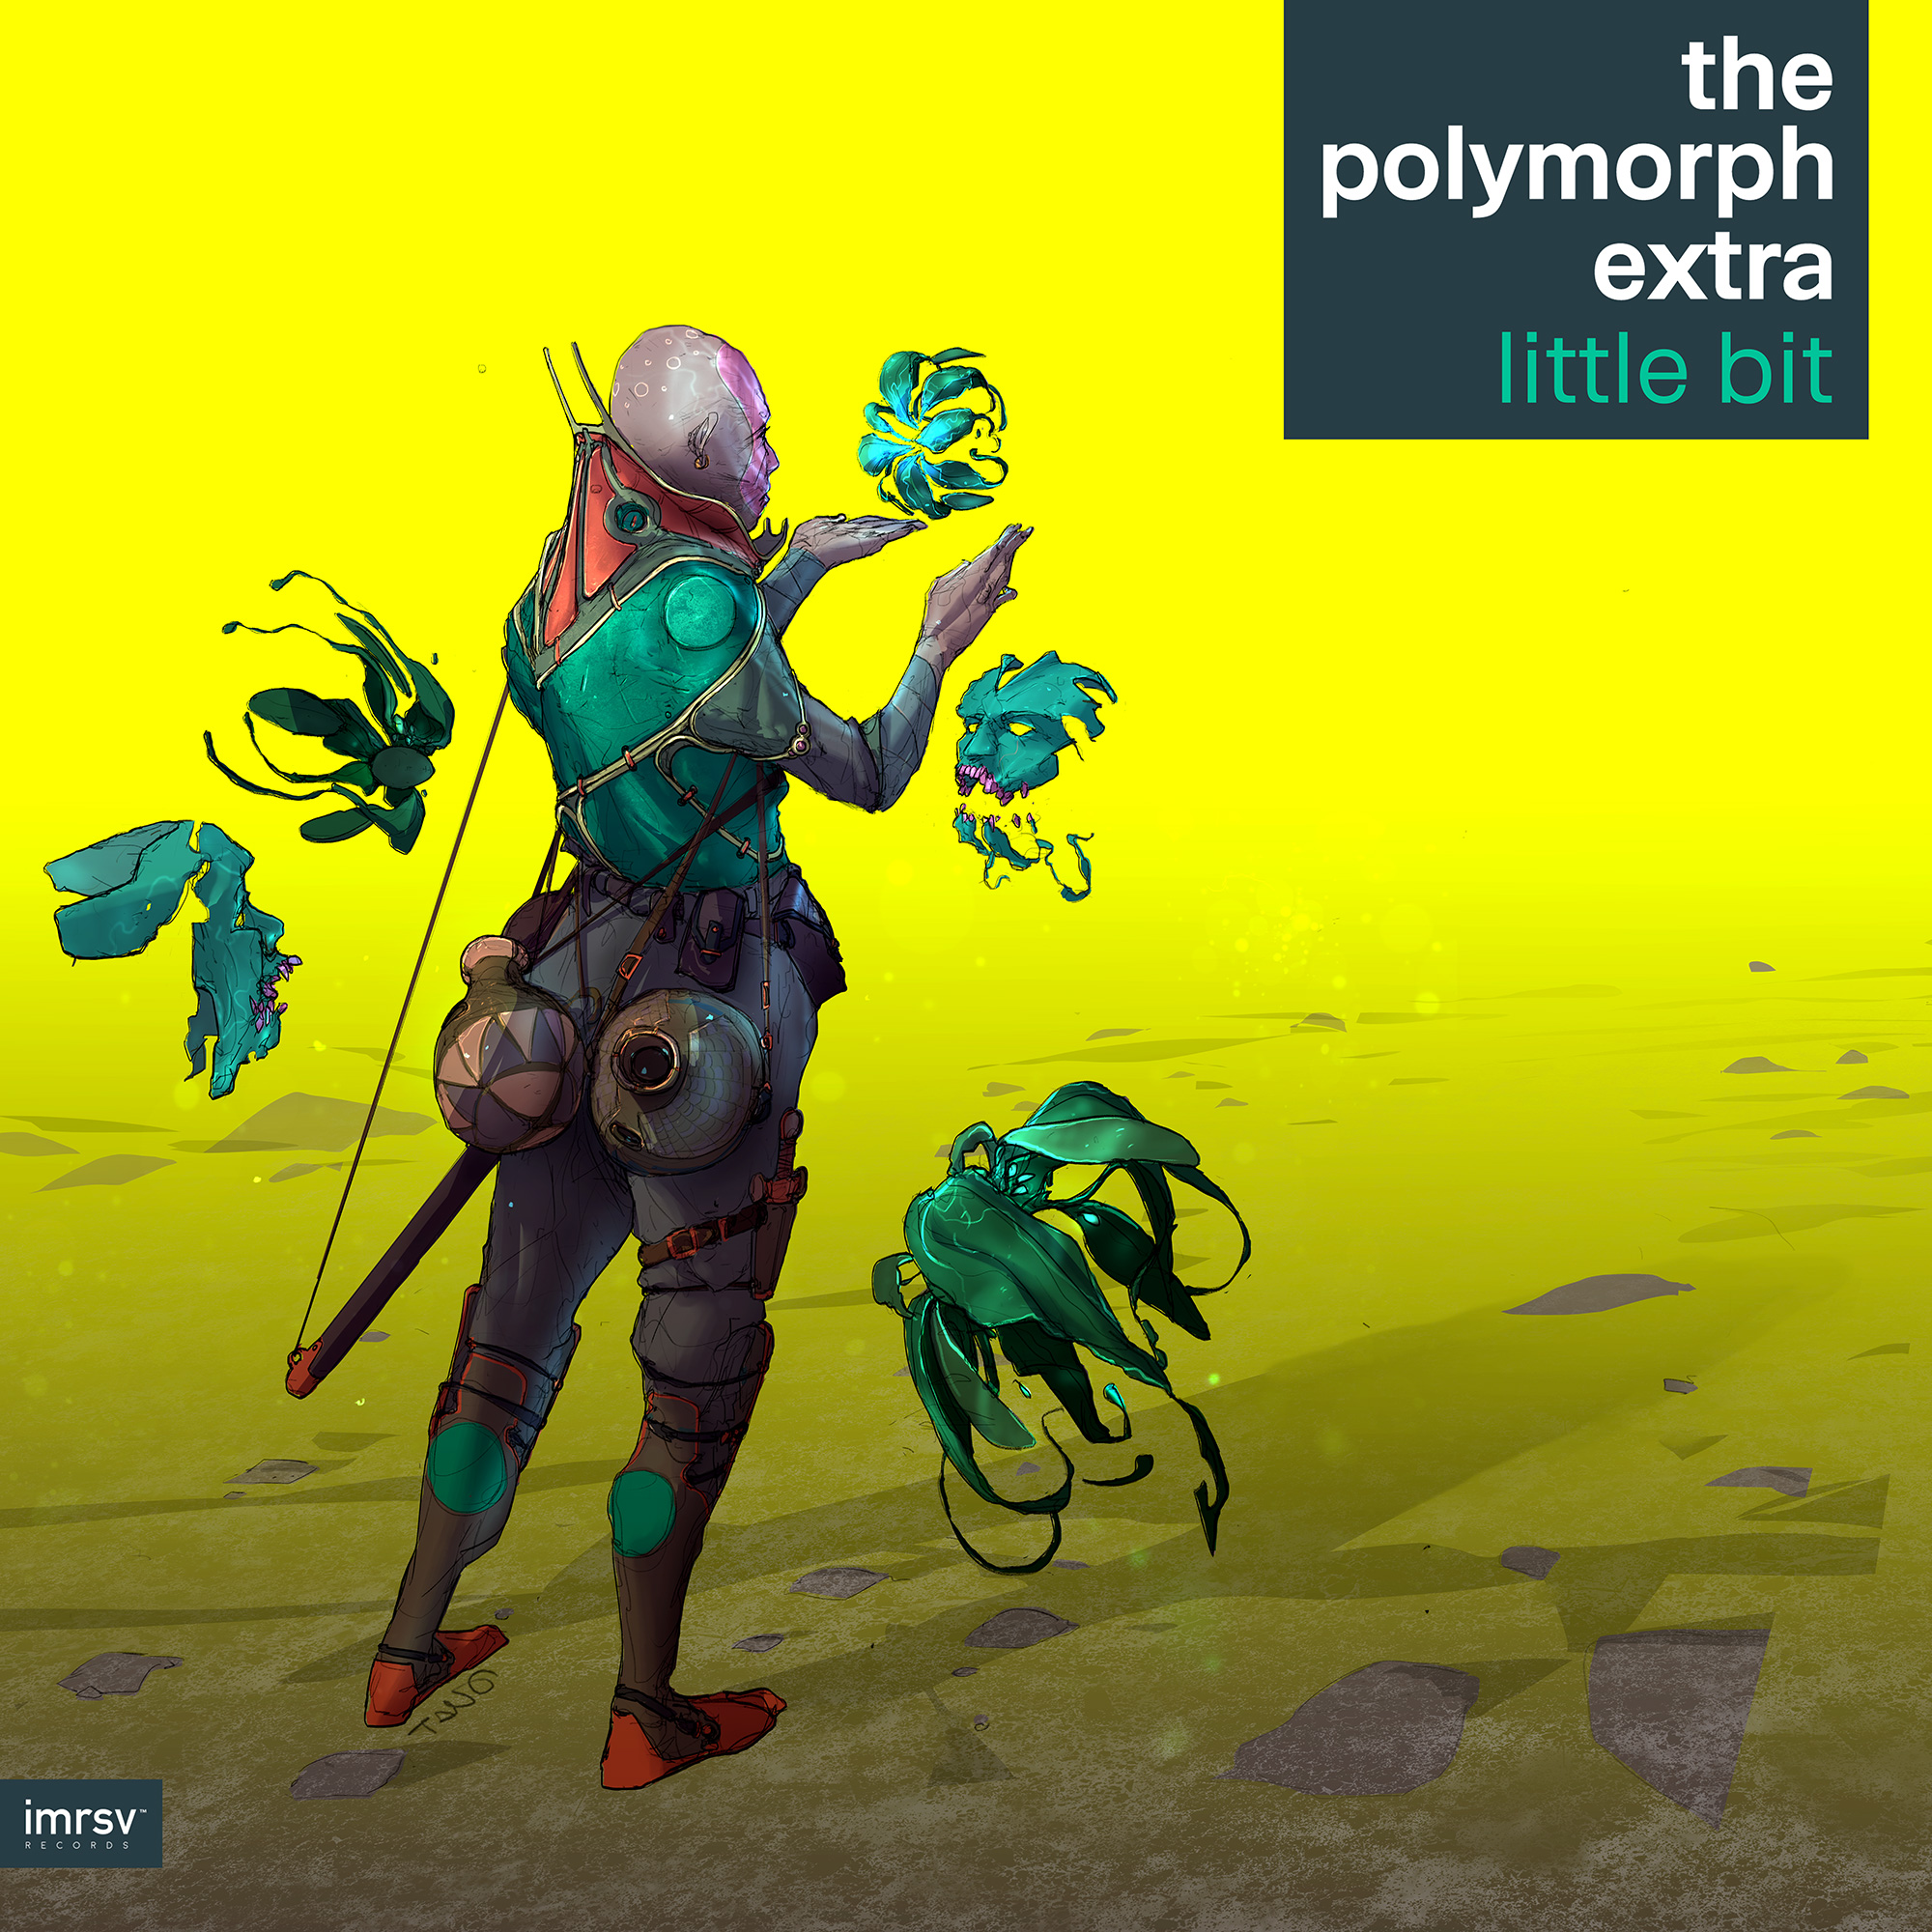 imrsv_records-The_Polymorph_Extra-LITTLE-BIT.jpg